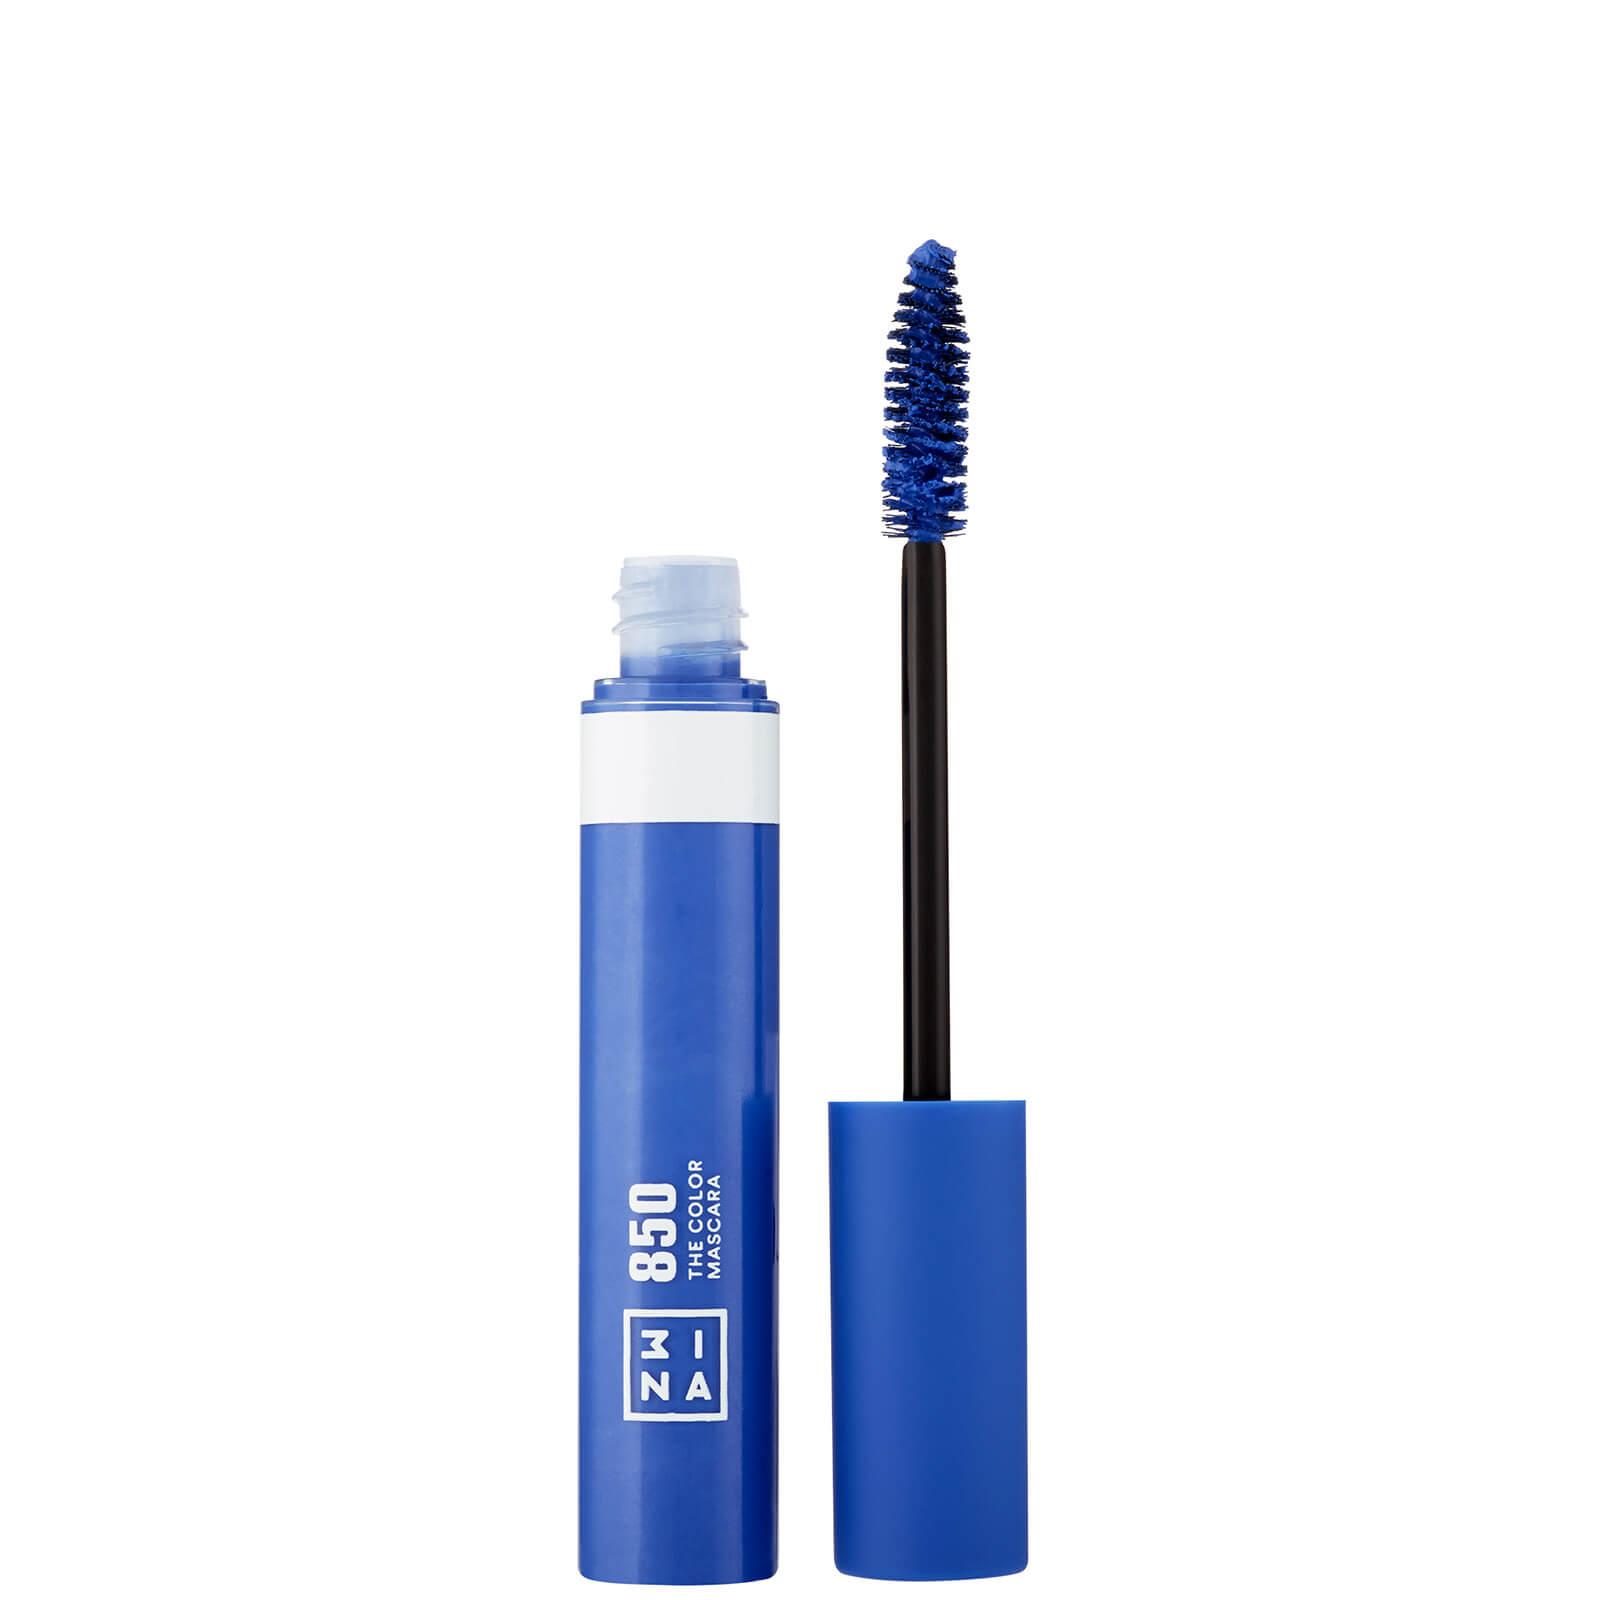 3INA Makeup The Colour Mascara (Various Shades) - Blue